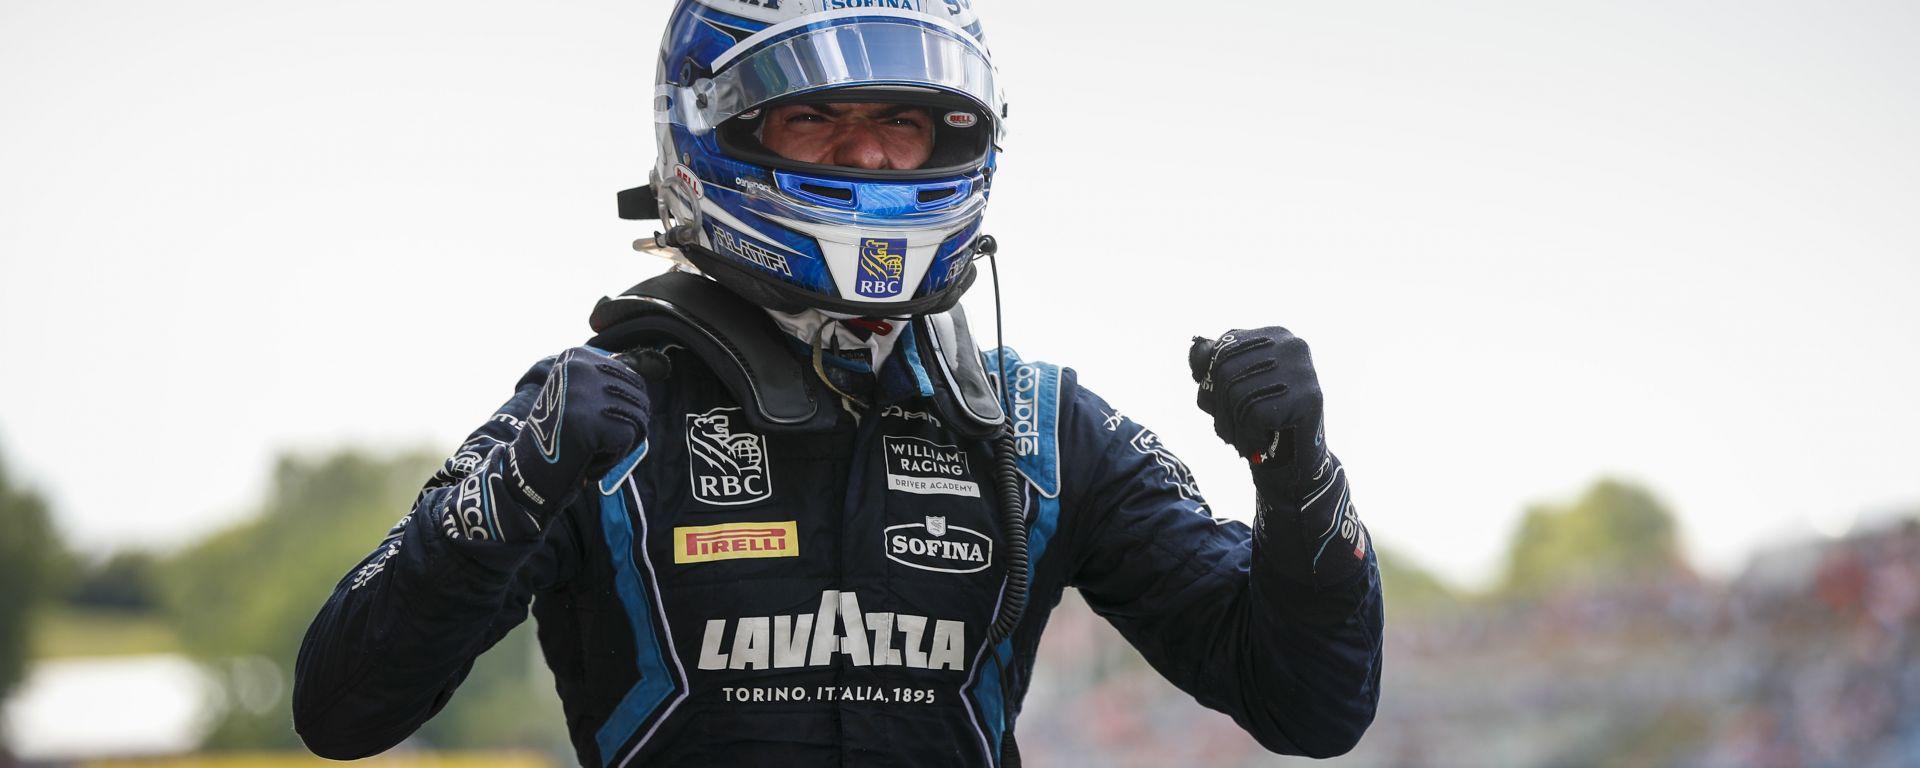 Formula 2 2019, Budapest: Nicholas Latifi (Dams) esulta dopo il traguardo